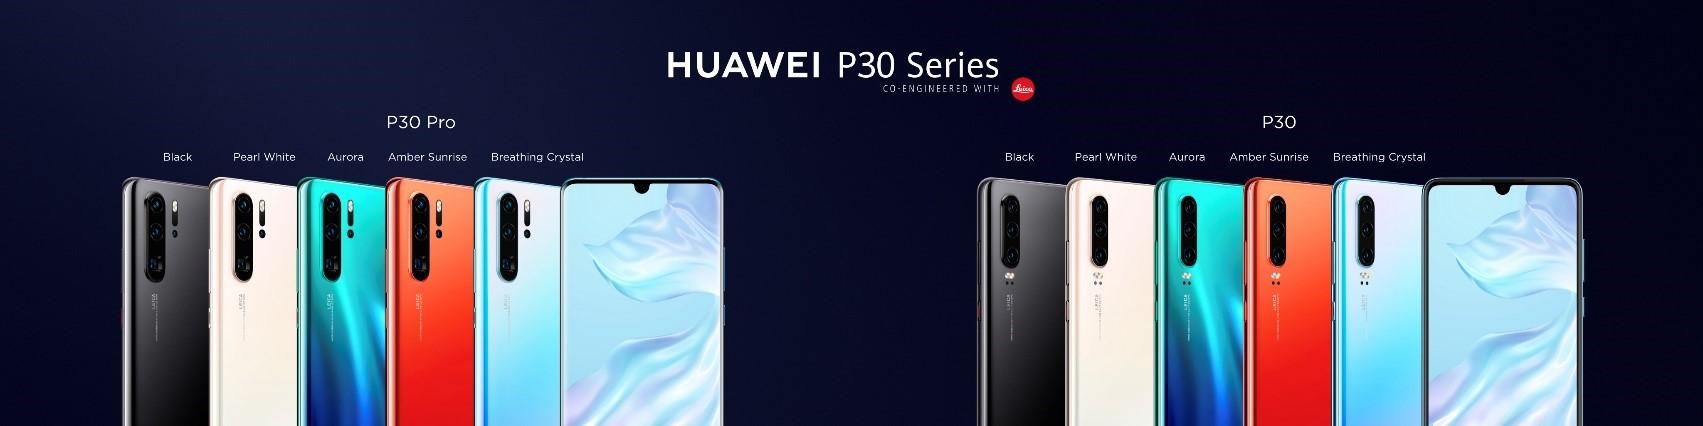 Huawei P30 Pro مواصفات وسعر 7agat Online